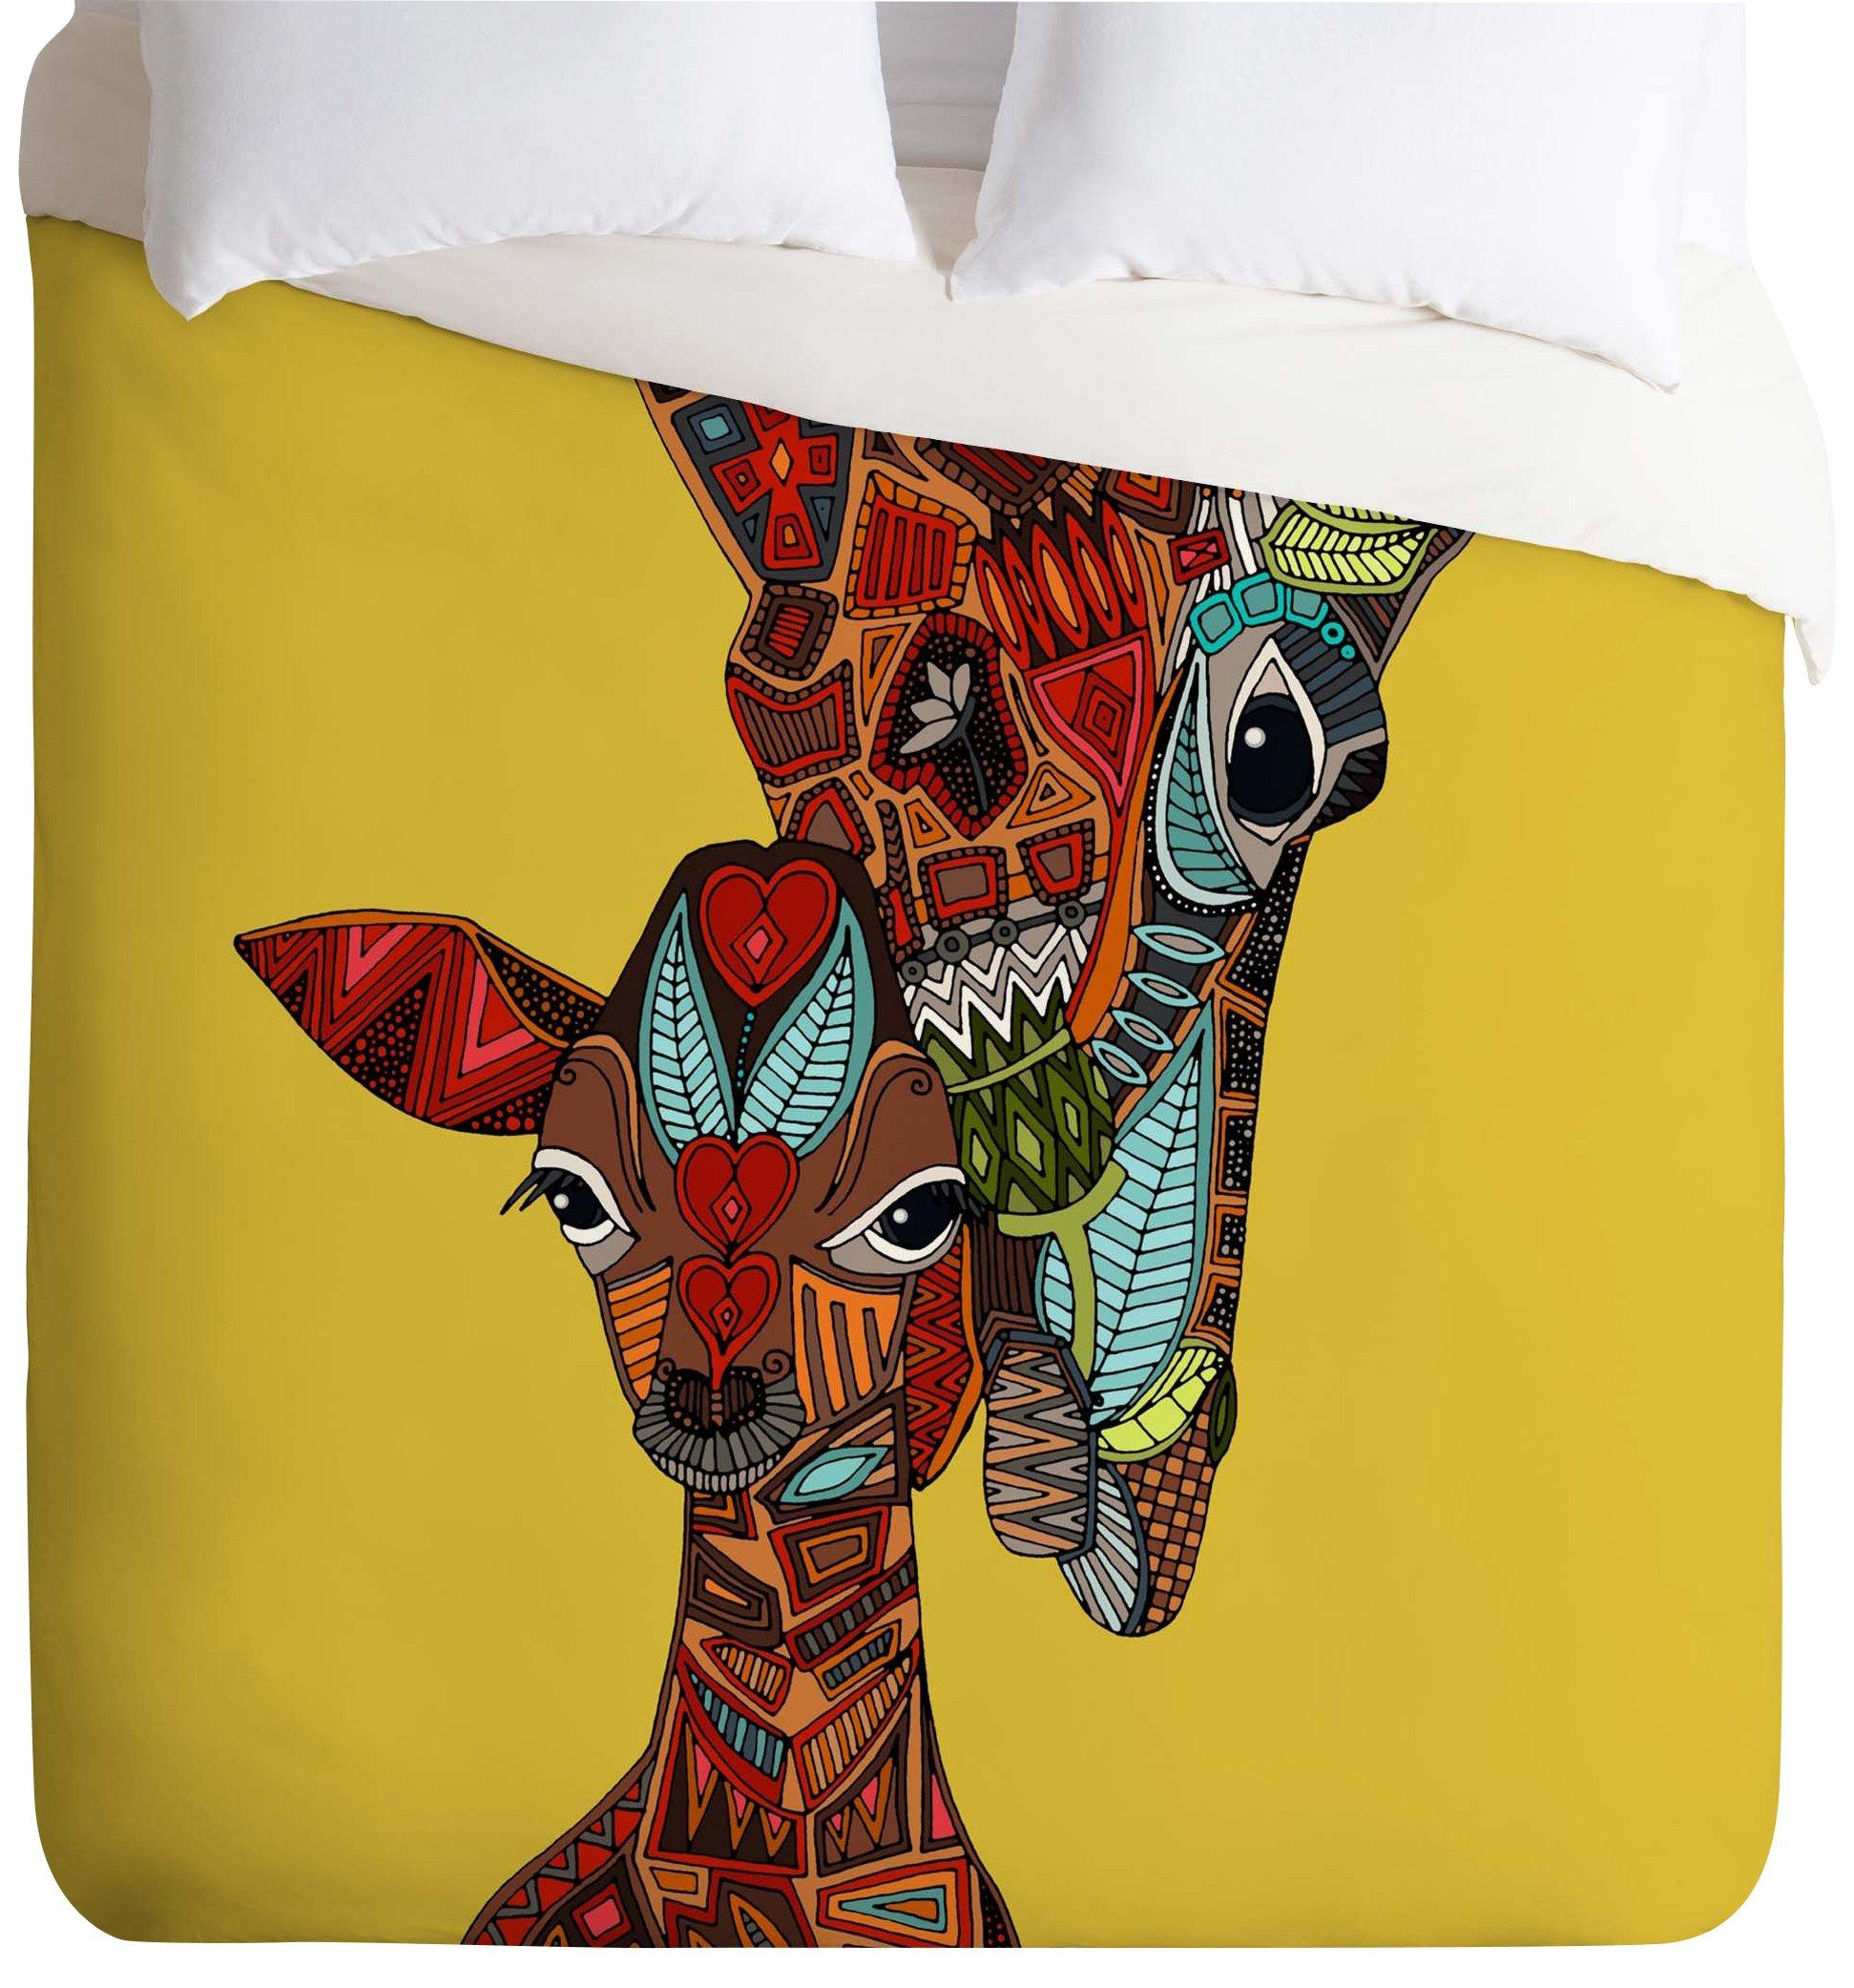 Deny Designs Sharon Turner Giraffe Love Ochre Duvet Cover, Queen